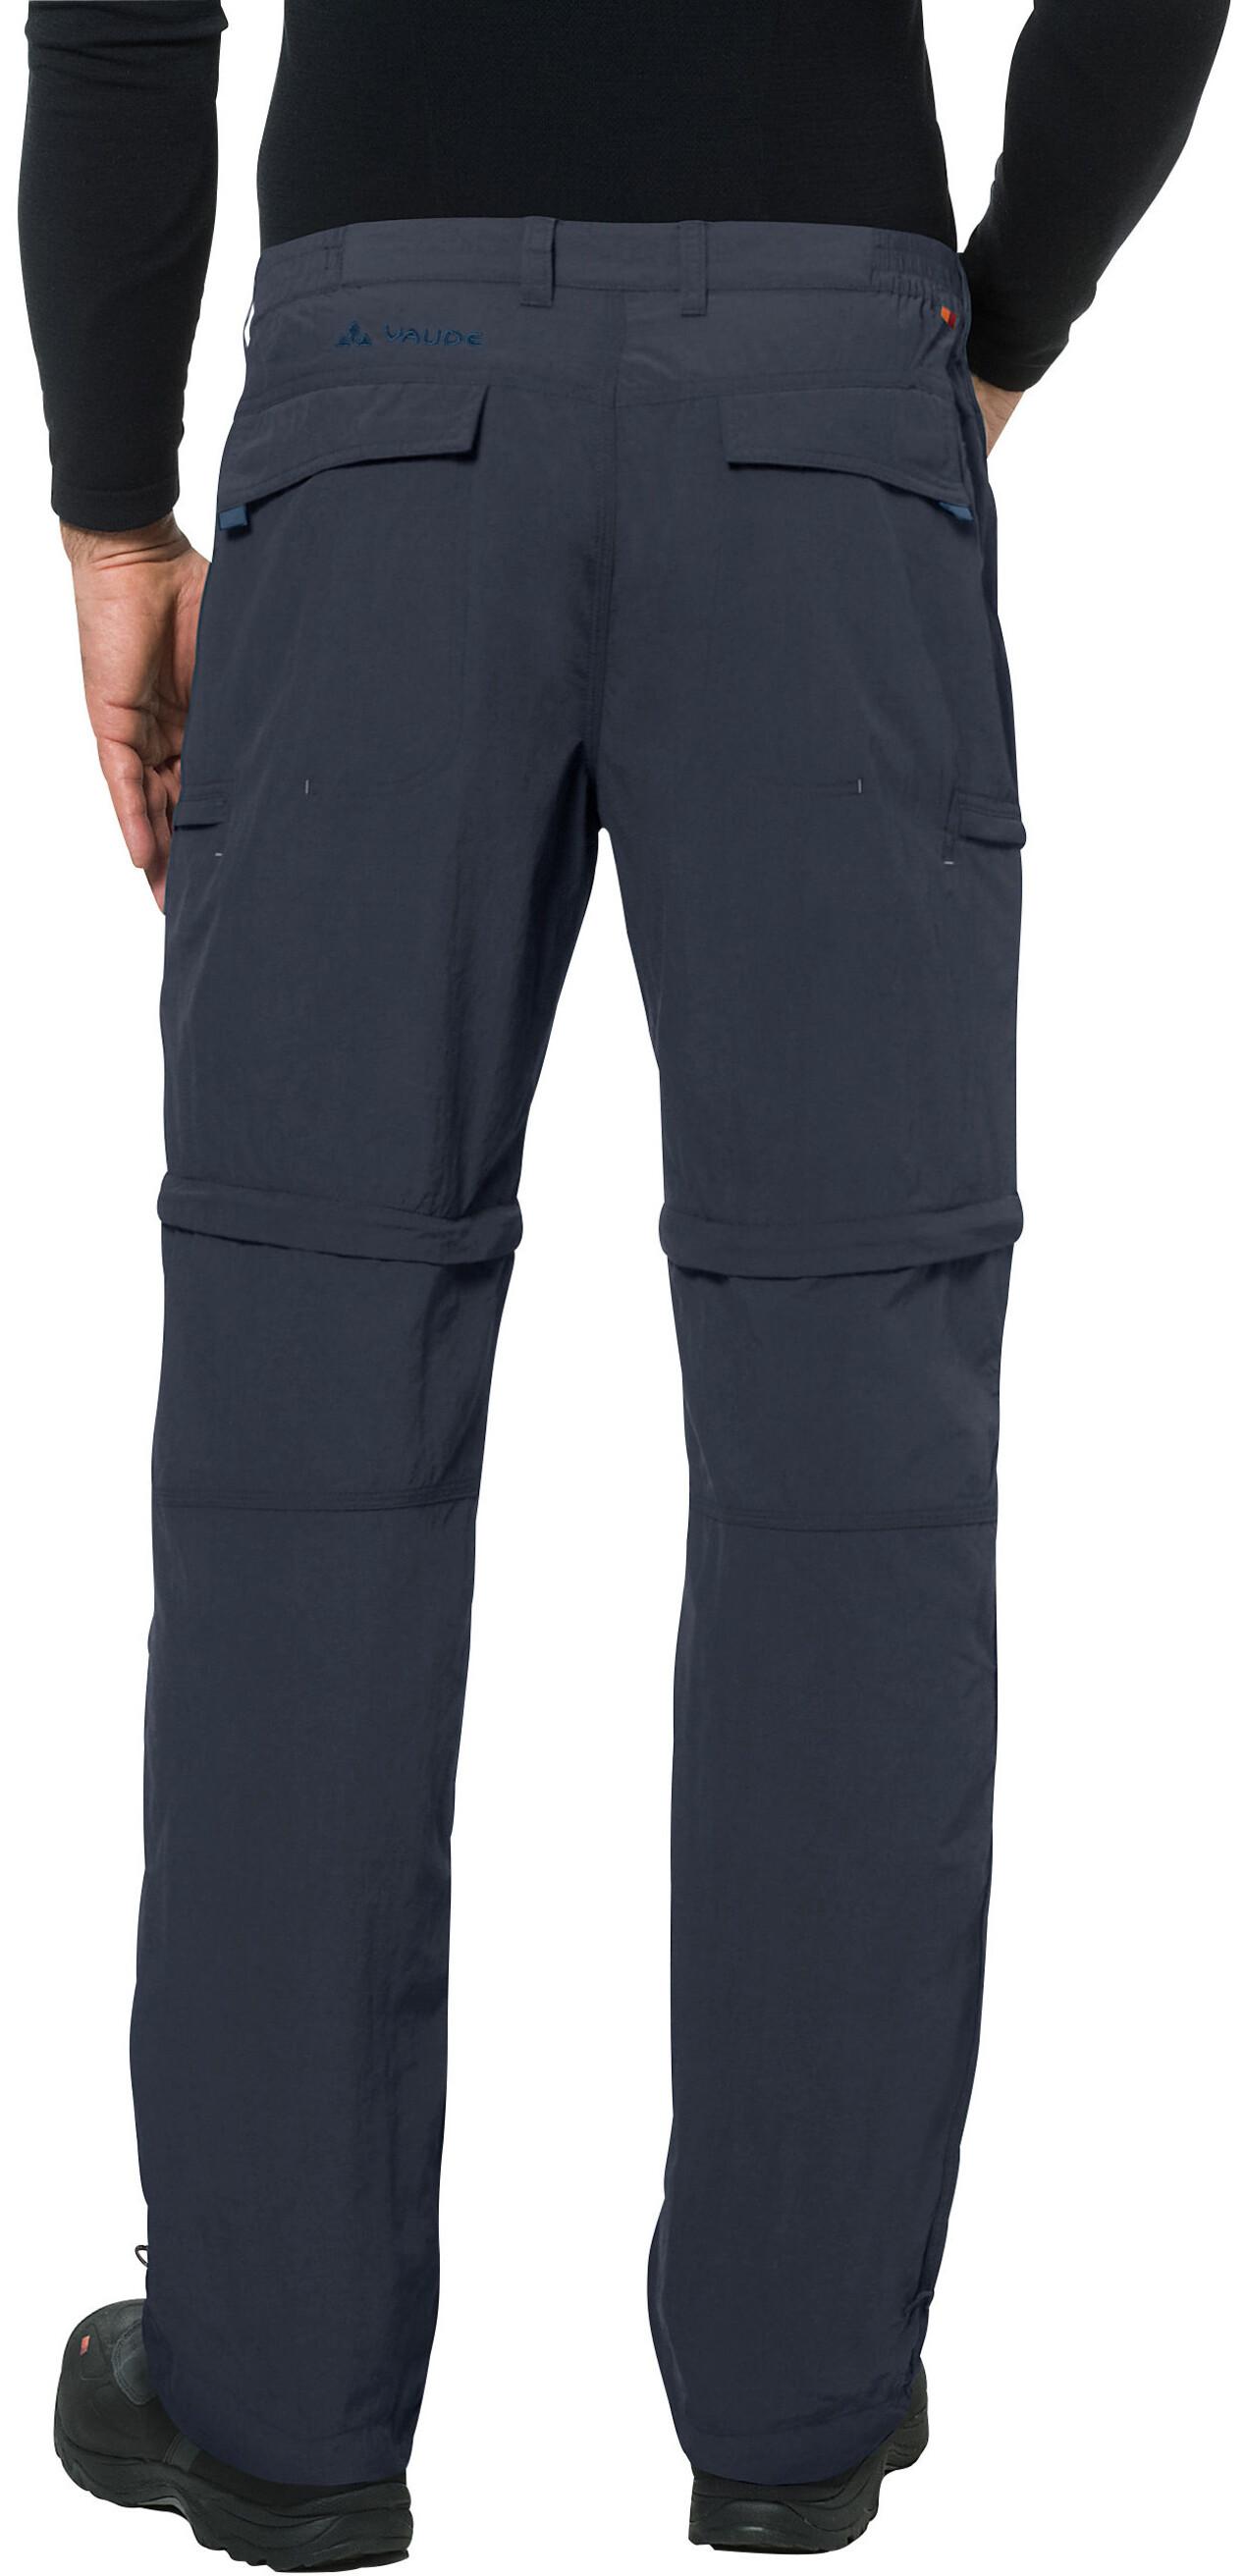 19cba5d3 VAUDE Farley IV ZO Pants short Men, eclipse | Find outdoortøj, sko ...